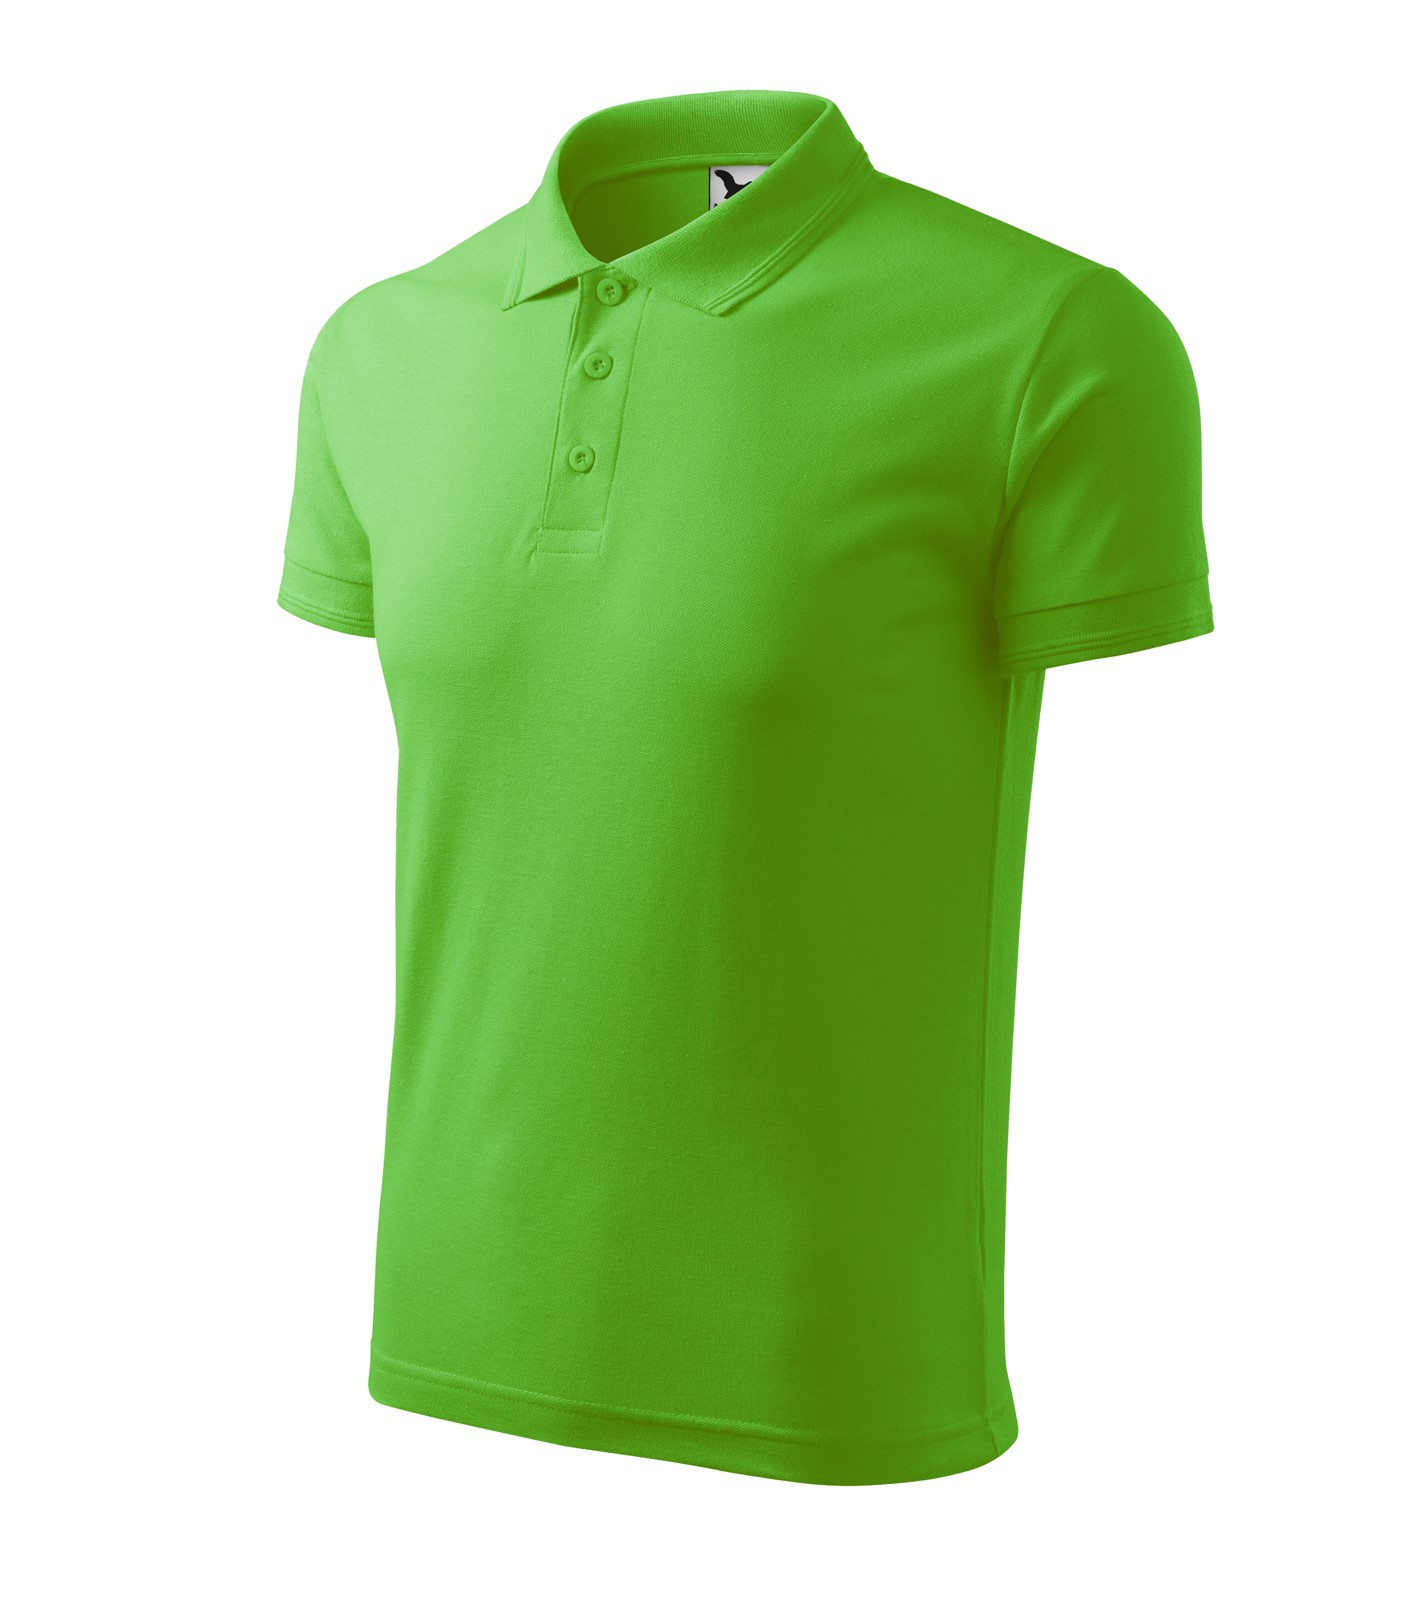 Polo Shirt Gents Malfini Pique Polo - Apple Green / M